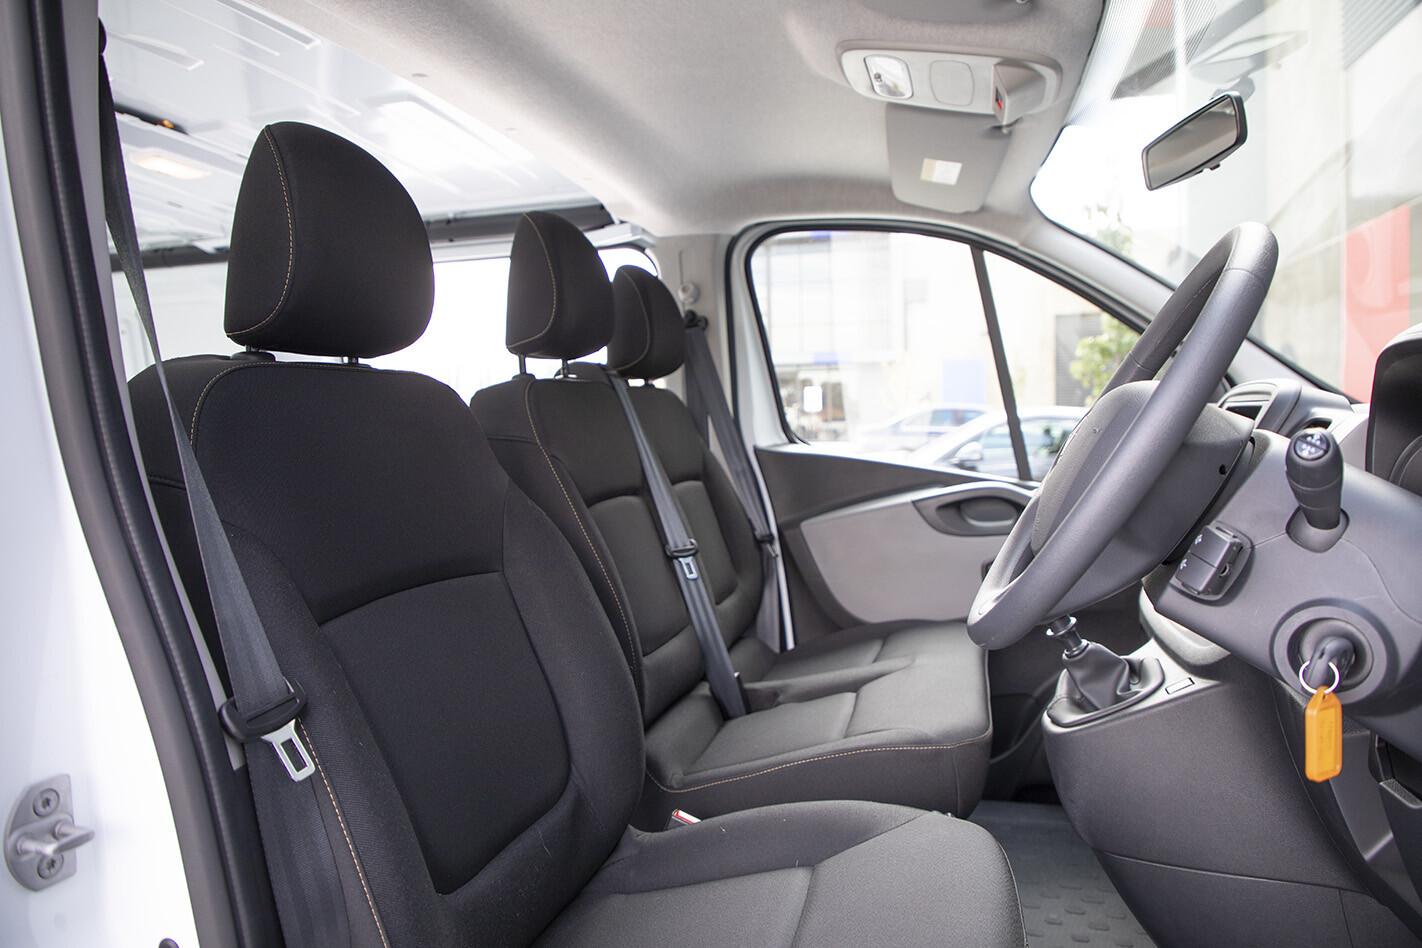 2019 Renault Trafic Traderlife Review Interior Frontseats Jpg